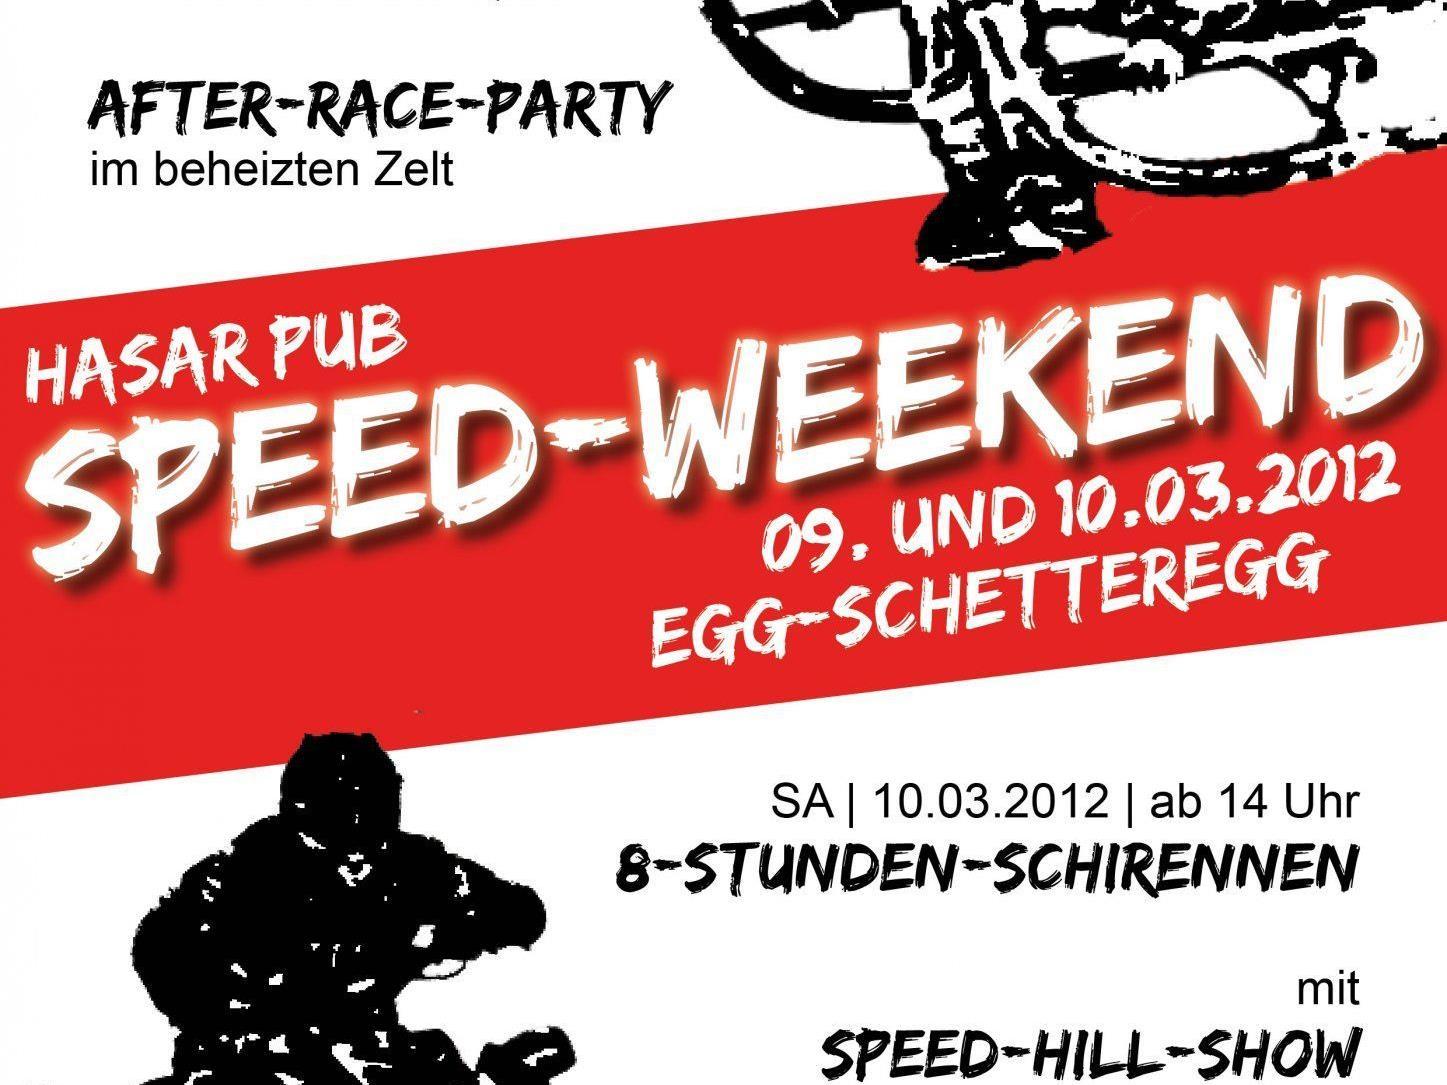 [Hasar Pub] Speed-Weekend